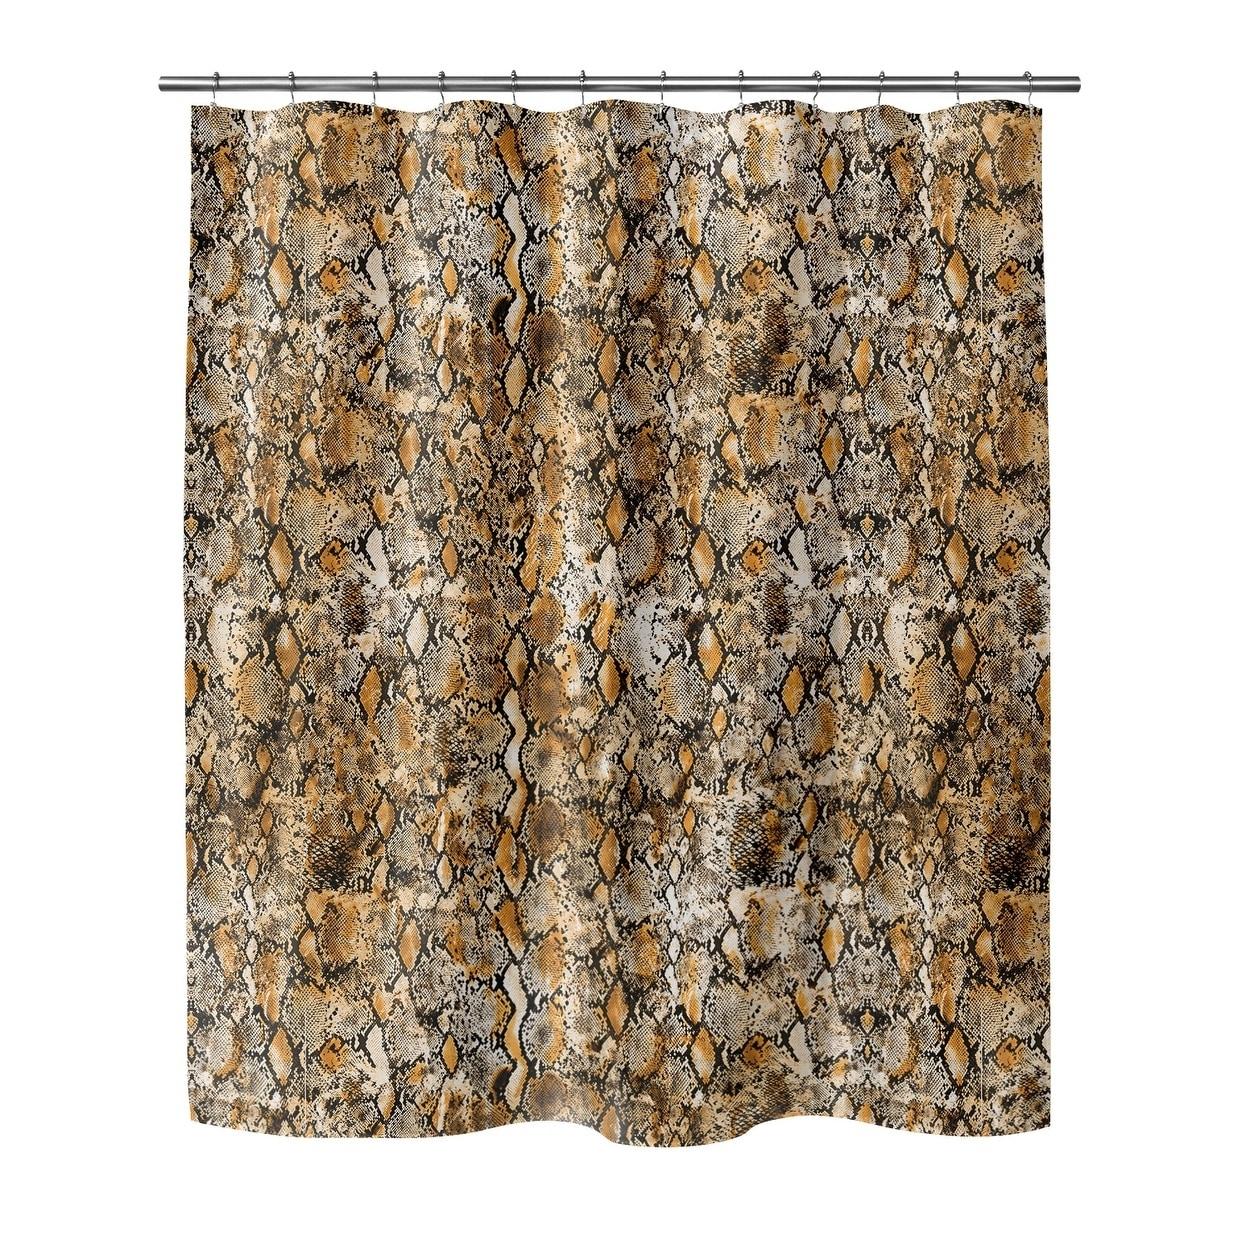 Shop Snakeskin Orange Shower Curtain By Kavka Designs On Sale Overstock 28574189